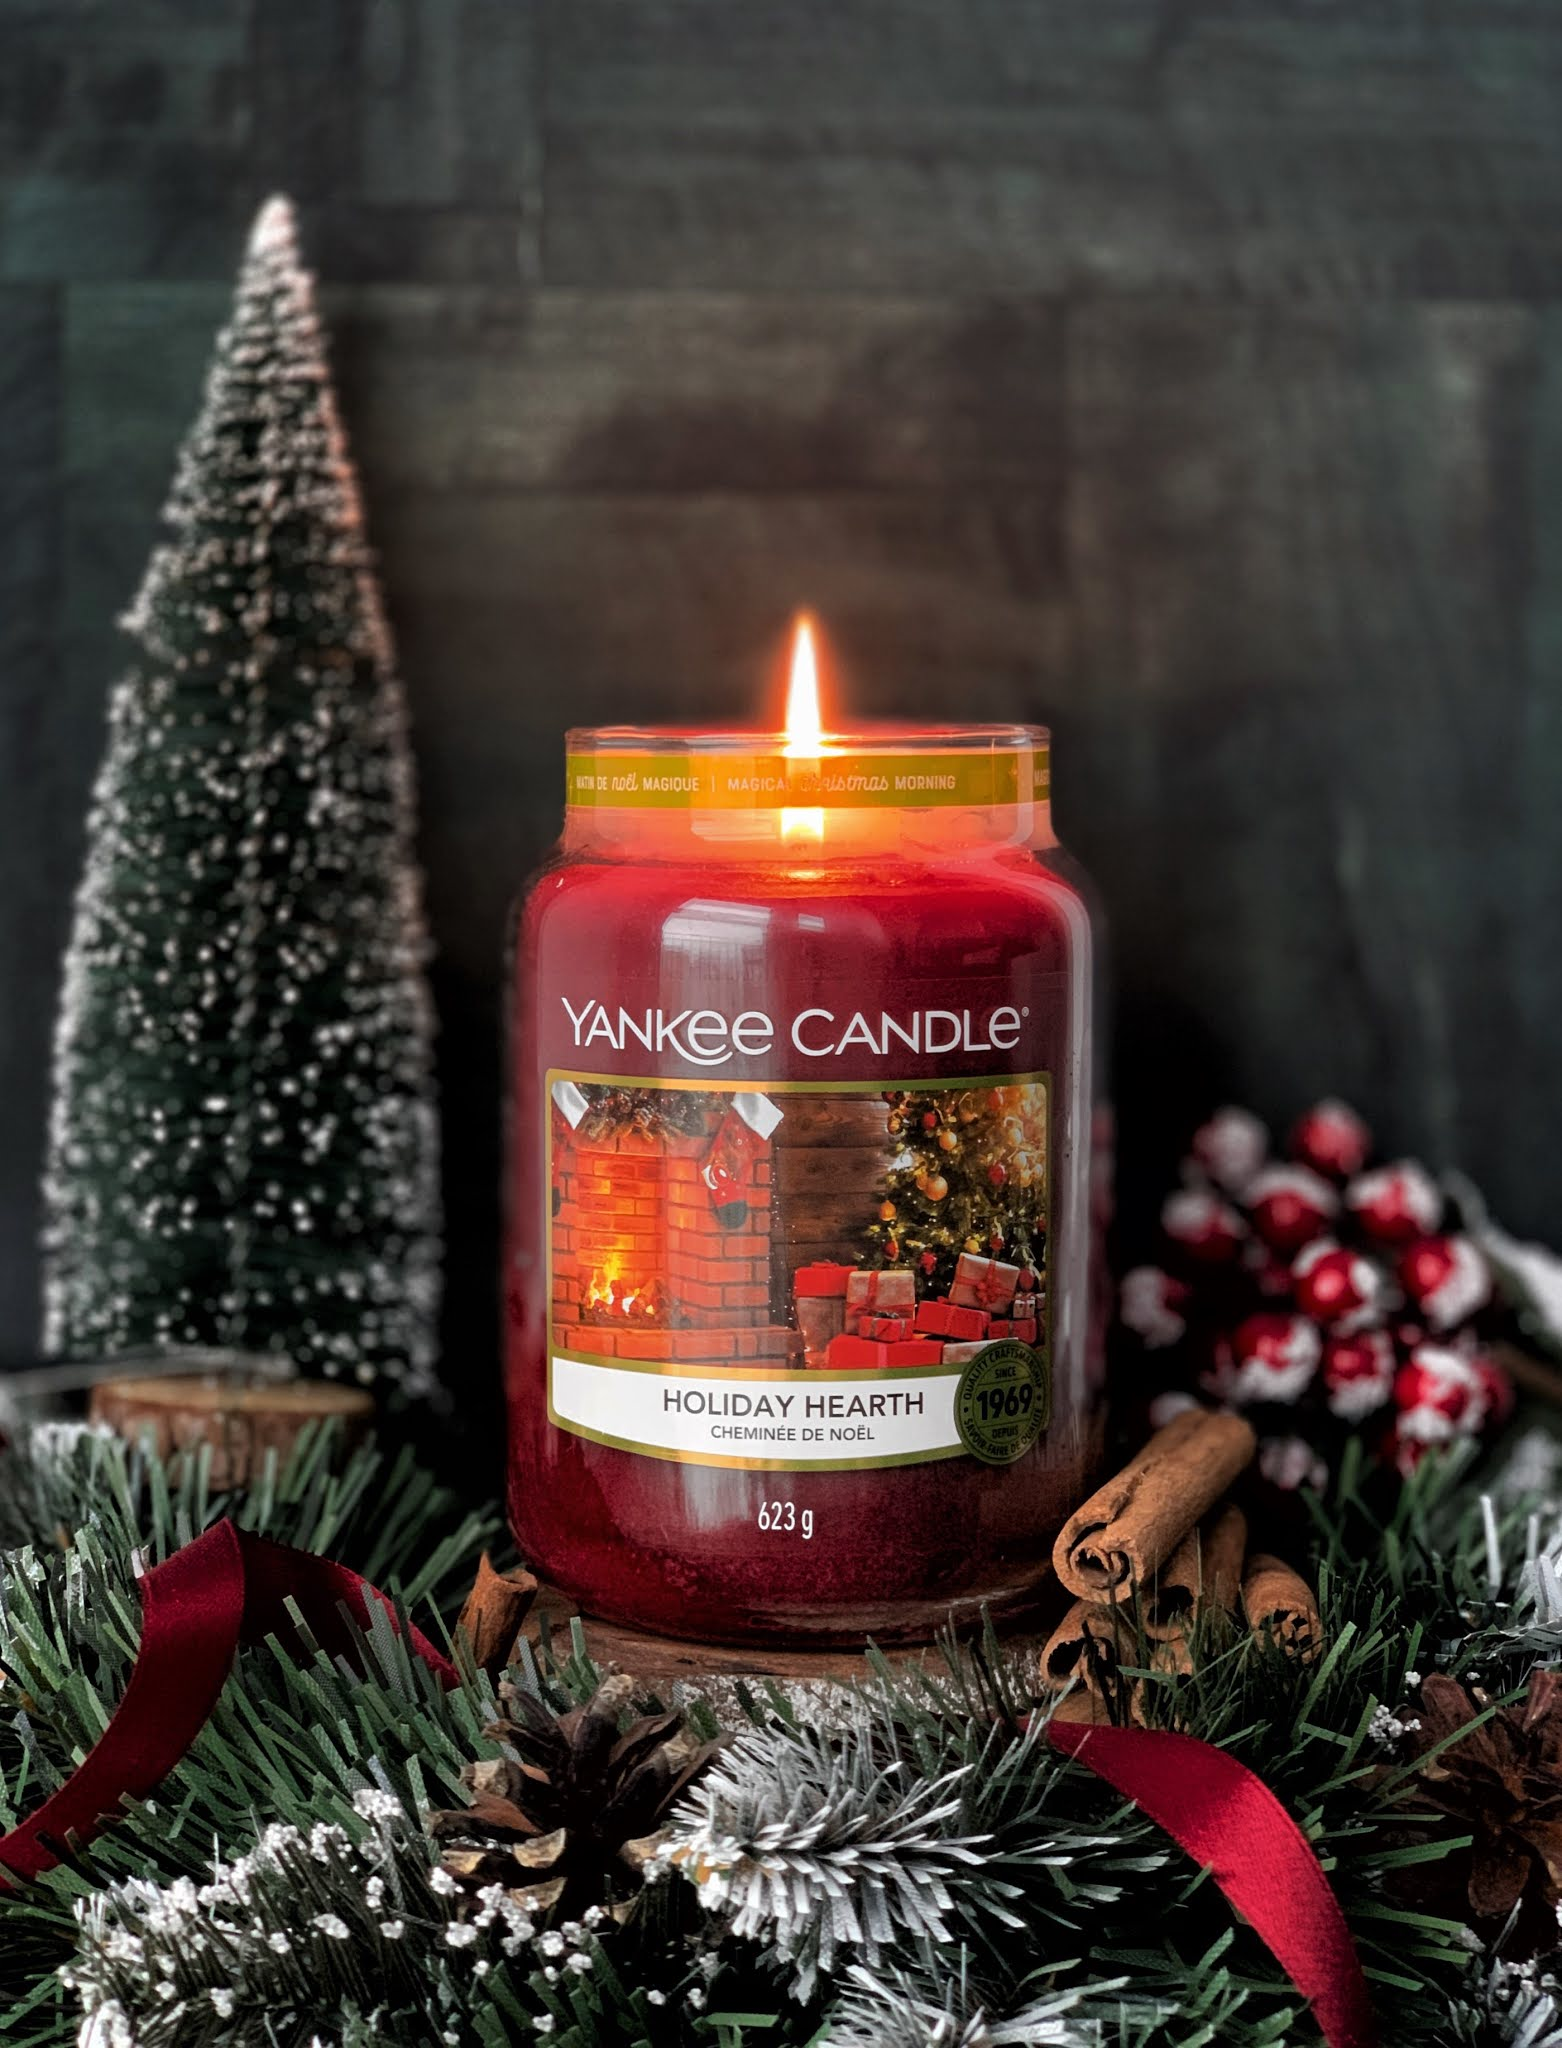 Holiday-Hearth-Yankee-Candle